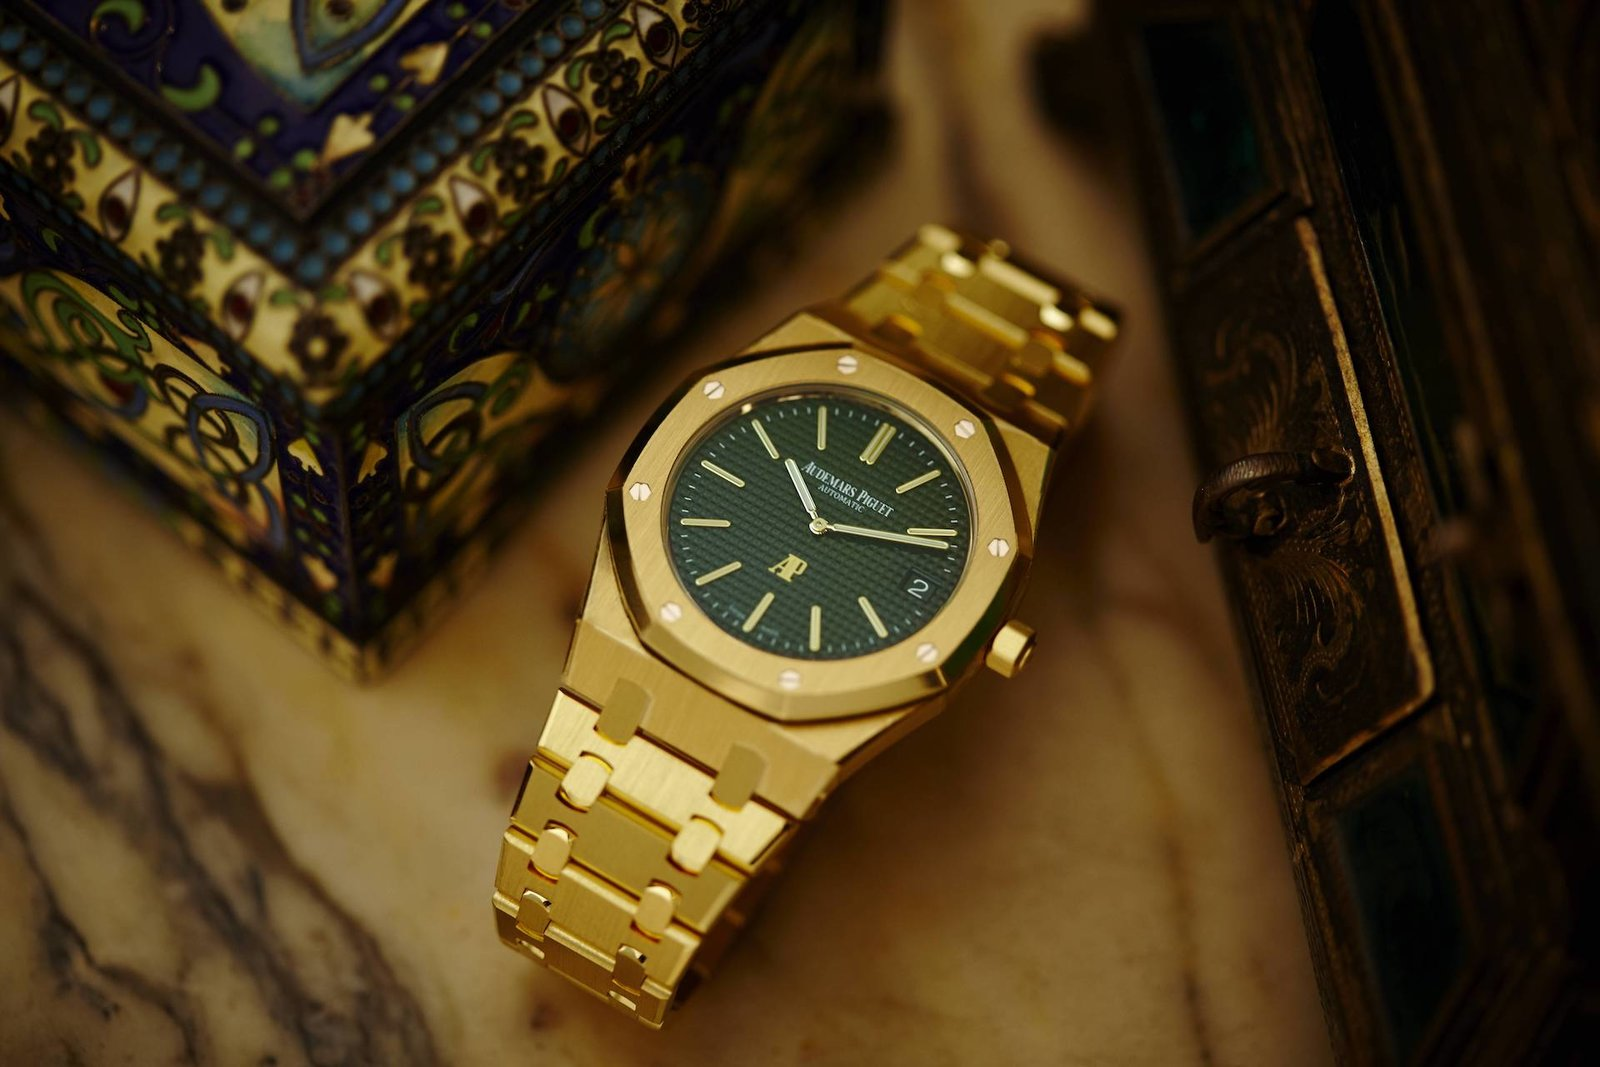 Audemars-Piguet-Royal-Oak-Extra-Thin-The-Hour-Glass-Limited-Edition-Timepiece-8.jpg